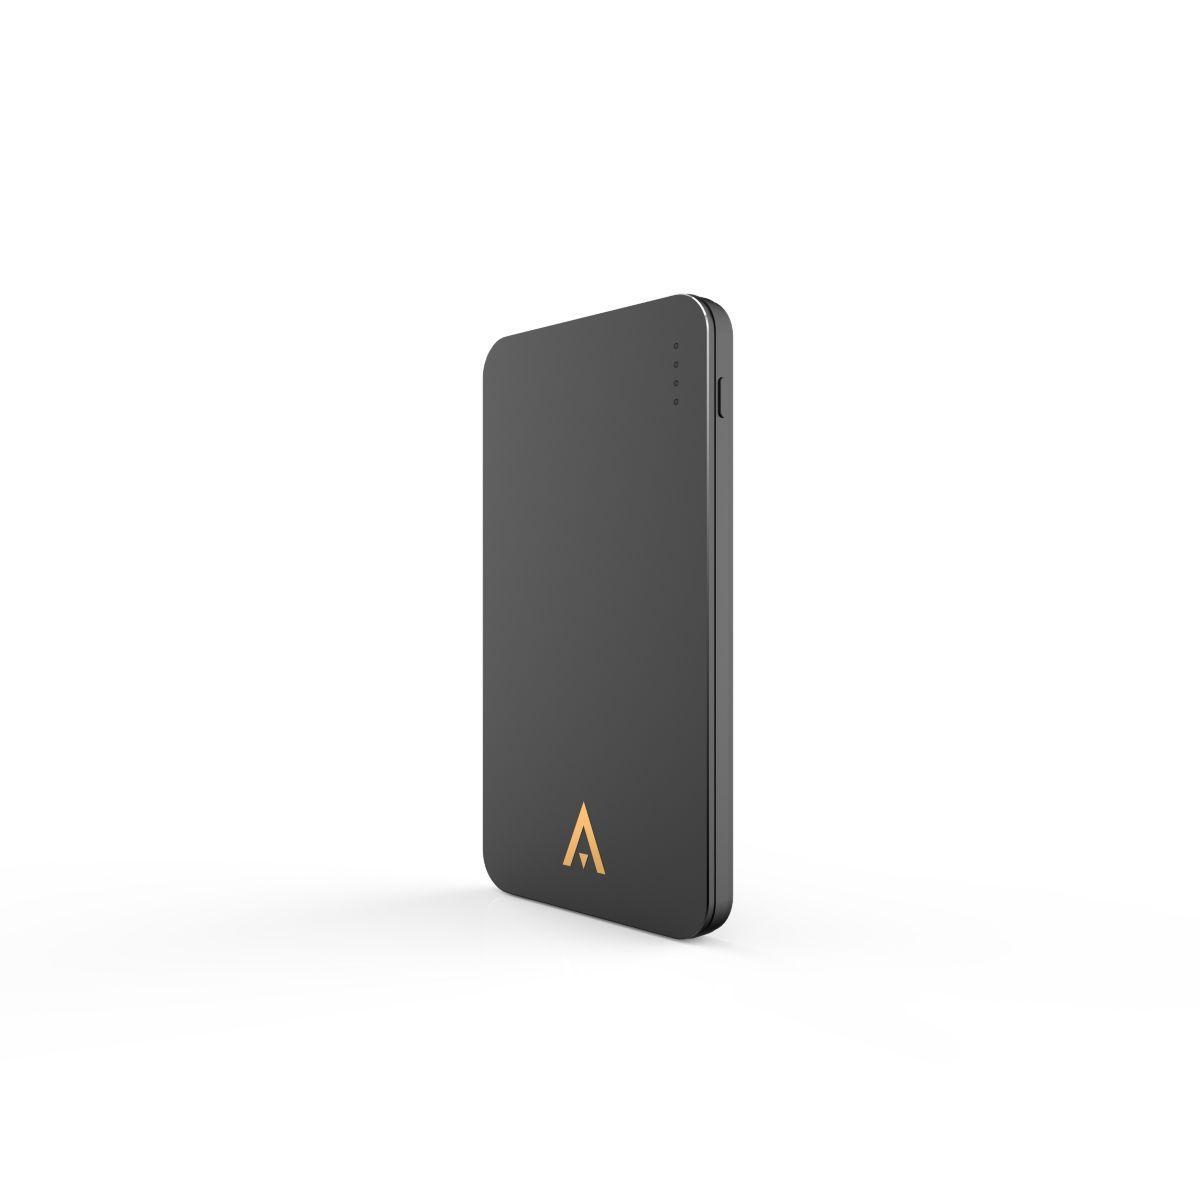 Batterie externe adeqwat 5000 mah noir 1 usb - livraison offerte : code liv (photo)